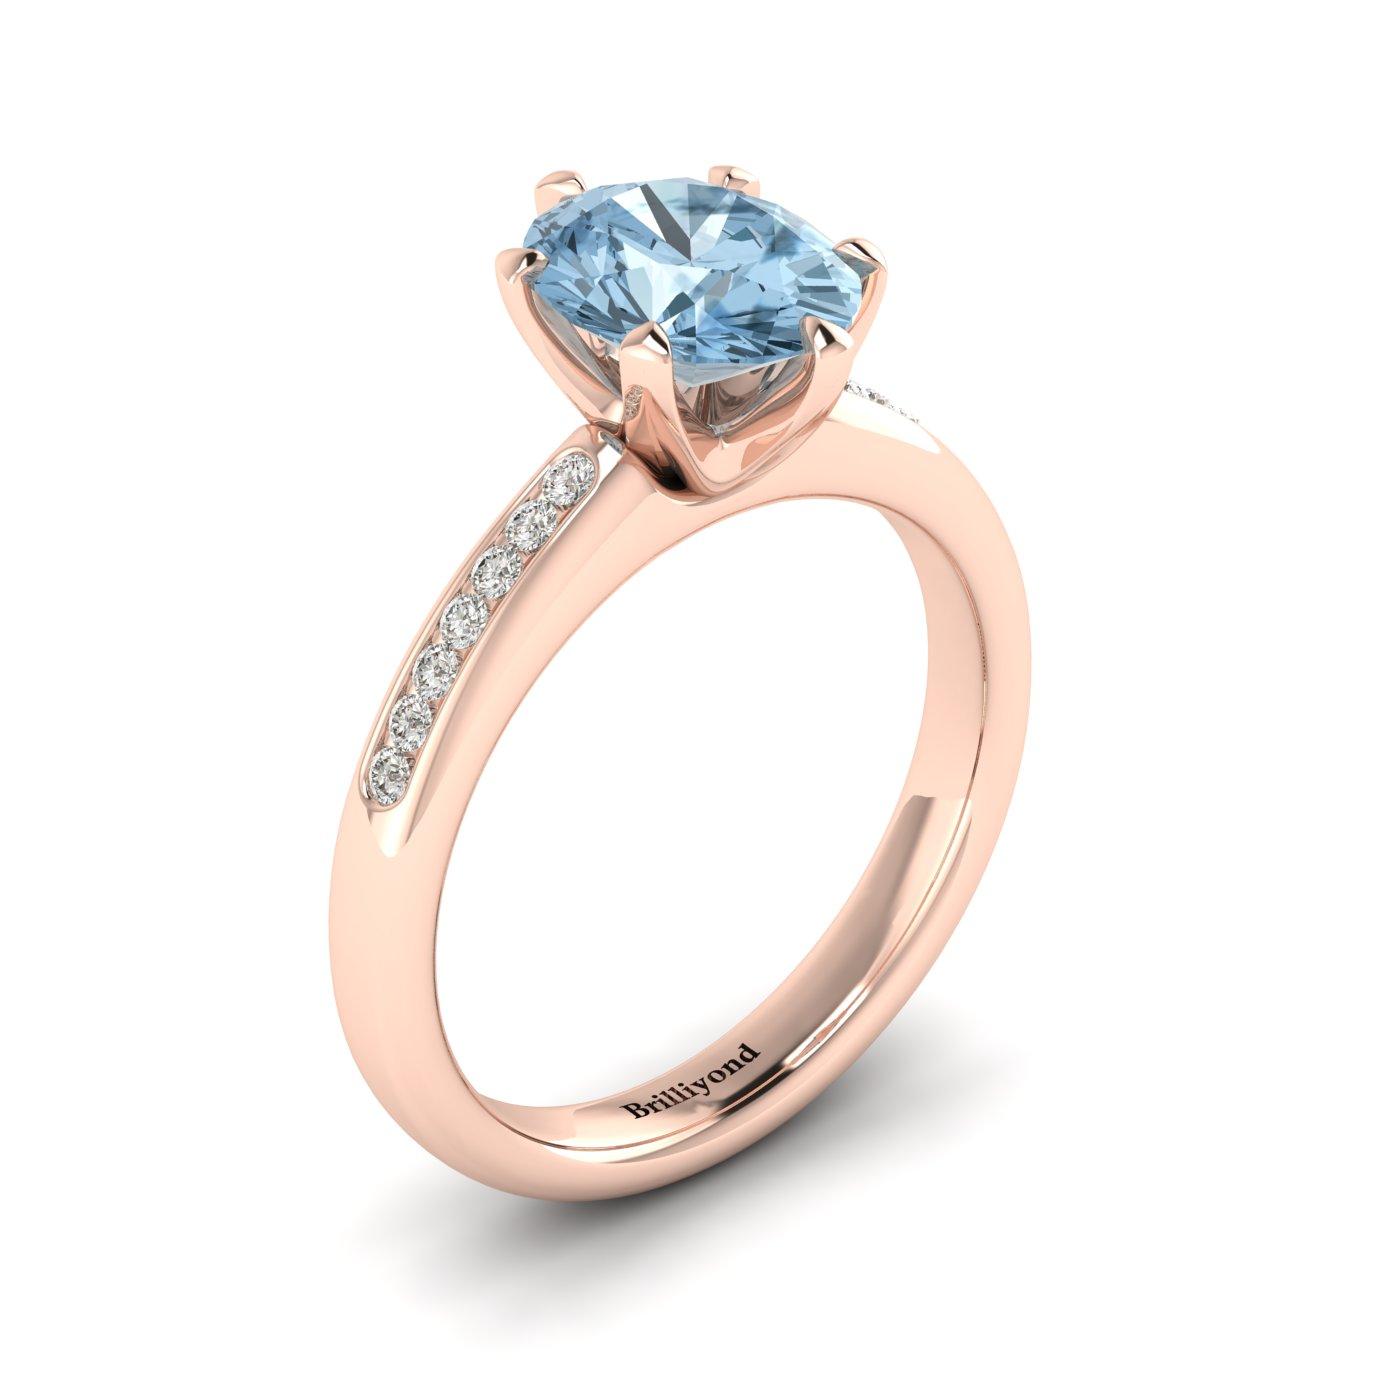 Aquamarine Rose Gold Oval Engagement Ring Nymph_image2